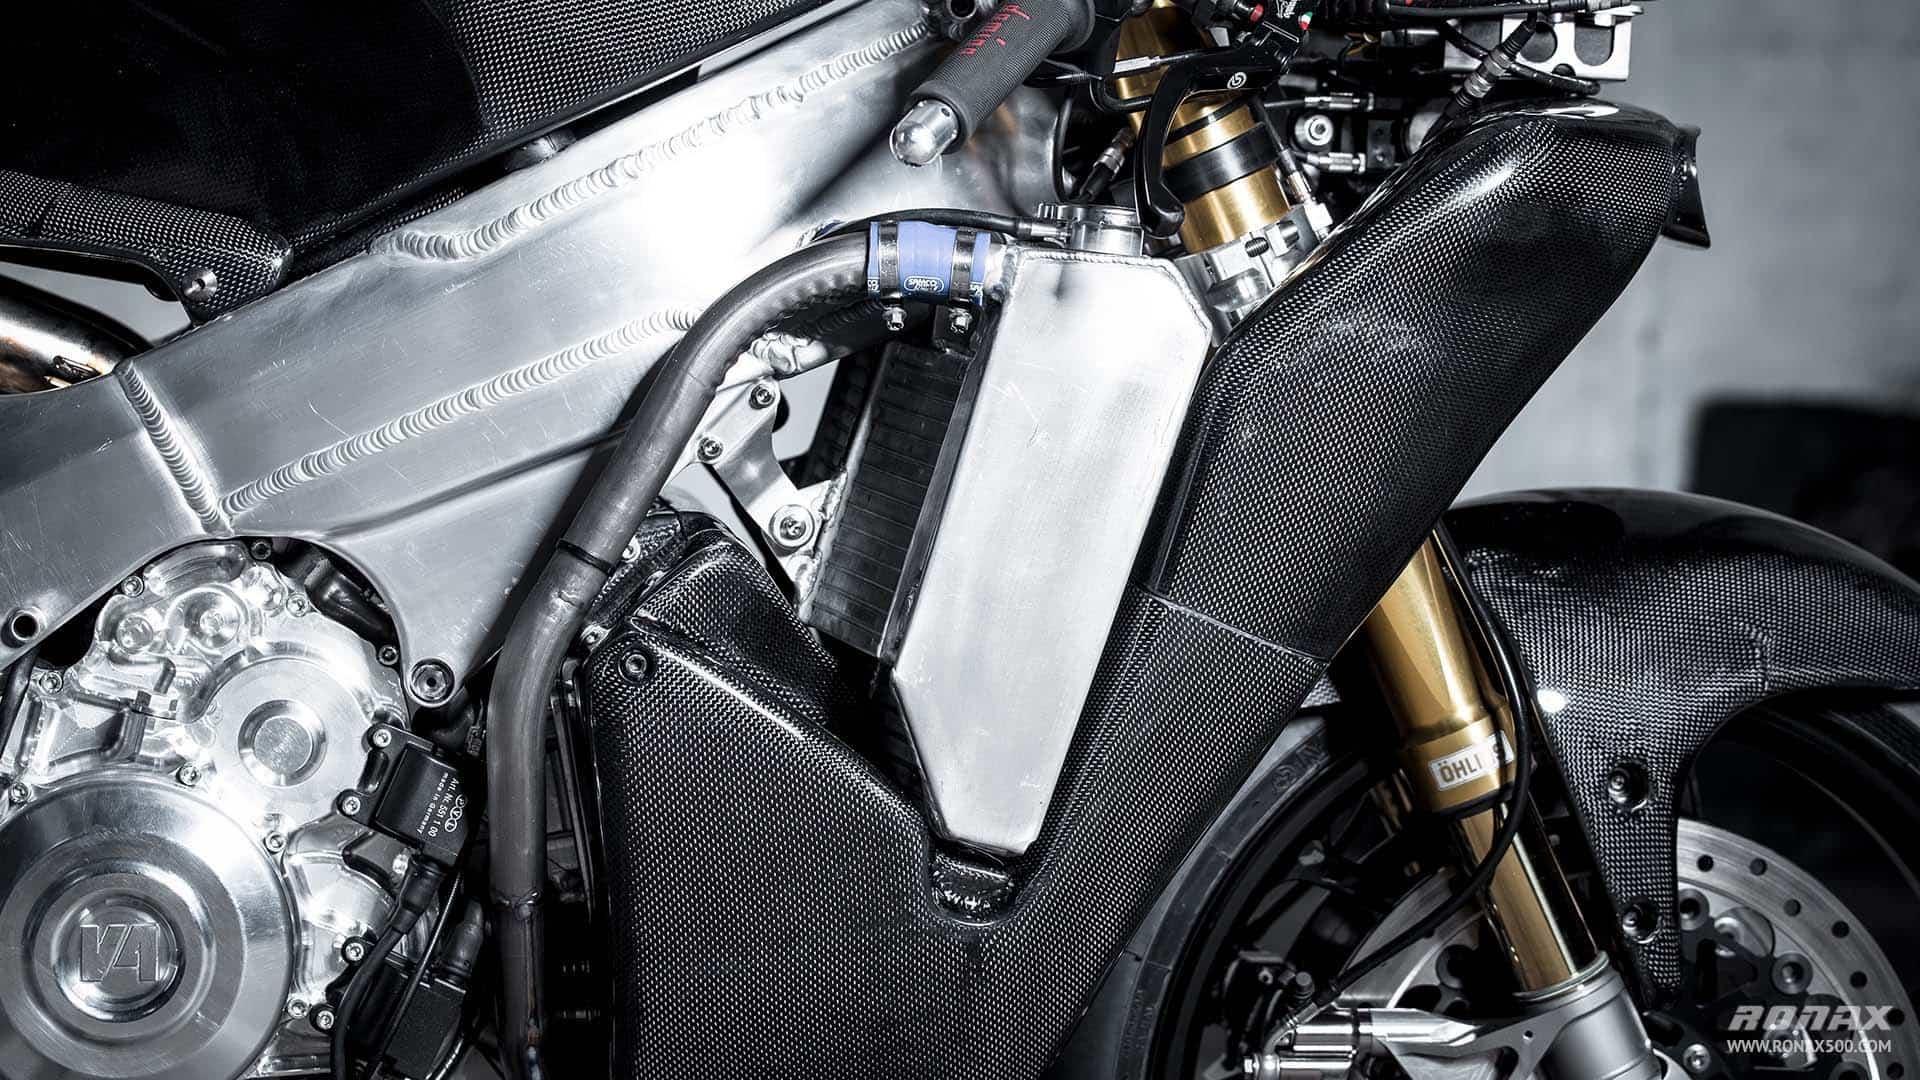 Ronax-500-Motorbike 15